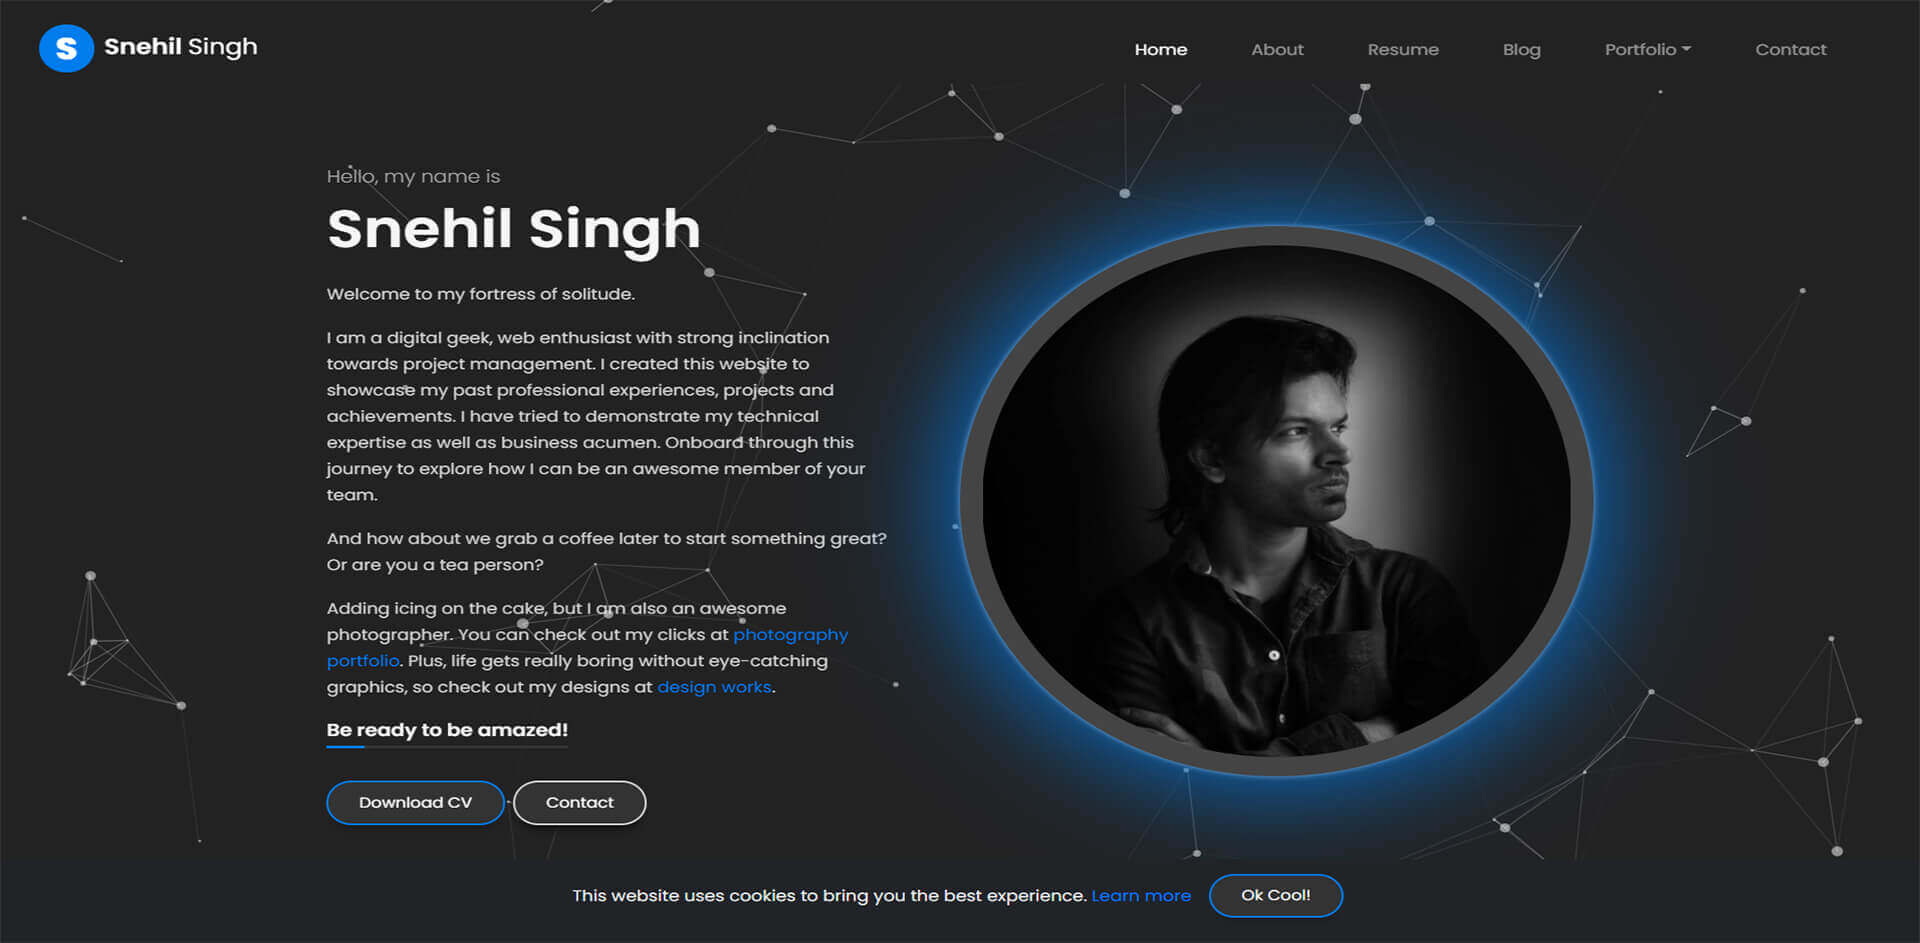 Snehil Singh Website Banner